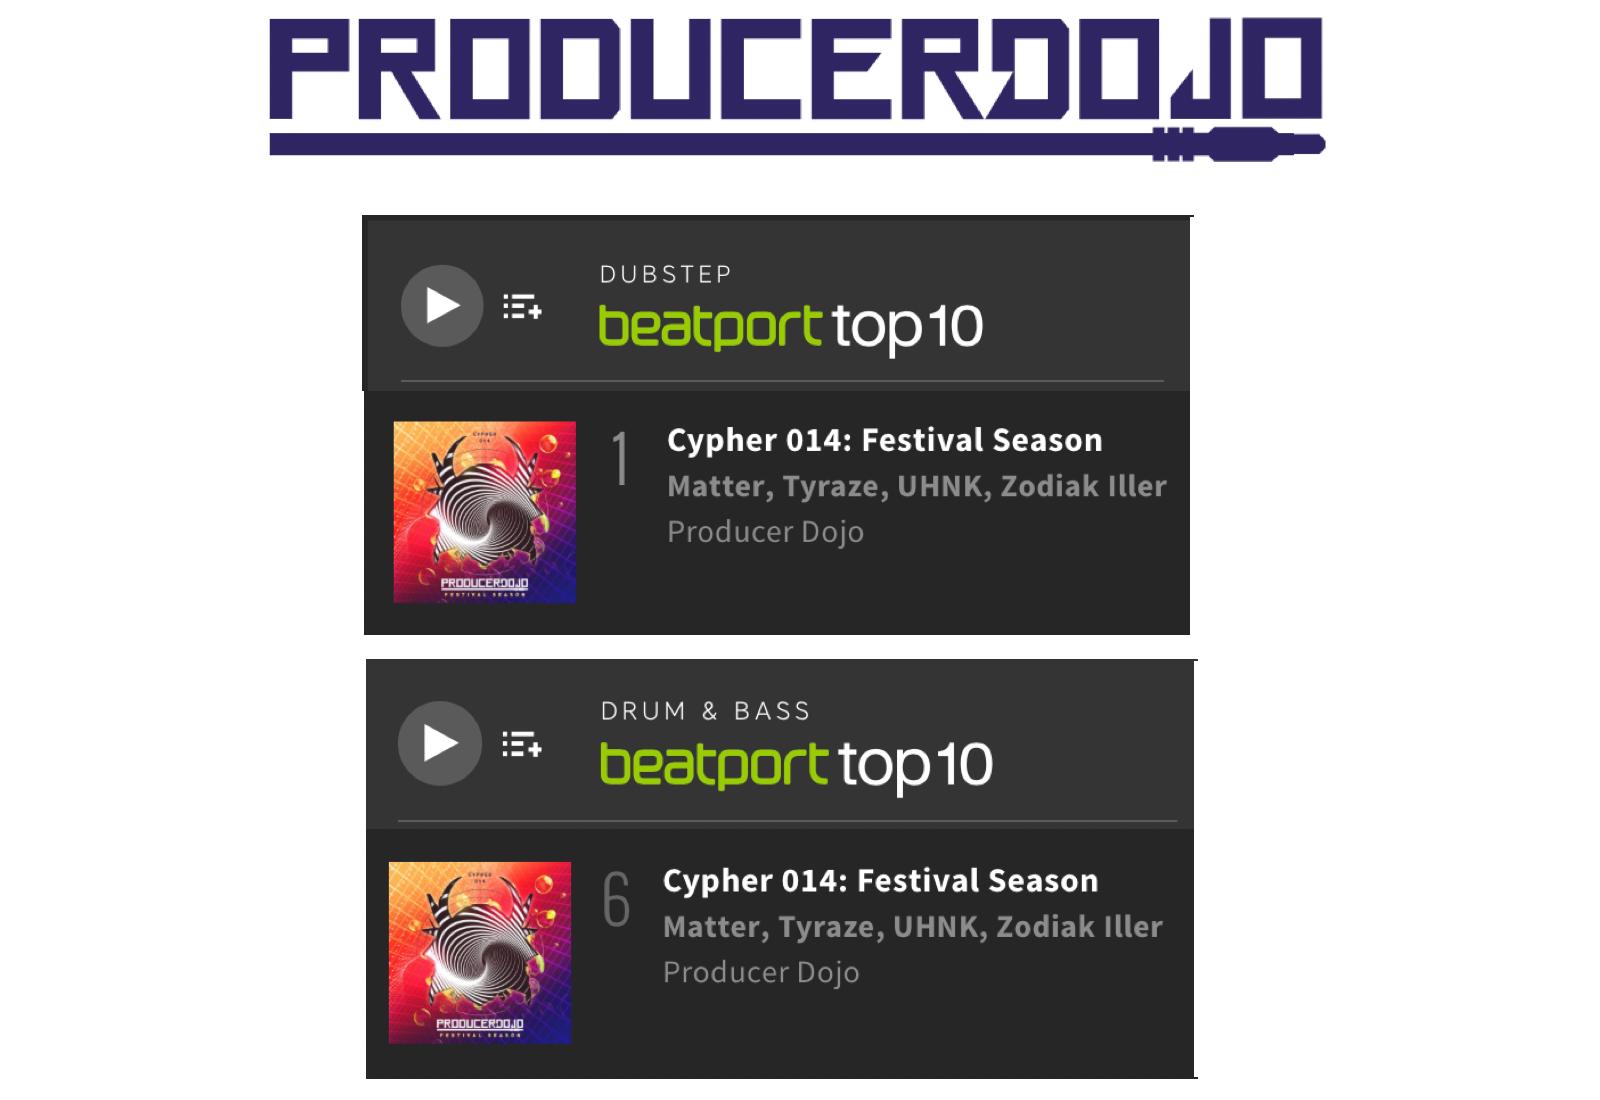 producer-dojo-beatport-top-10-fixed-mastering-engineer.png